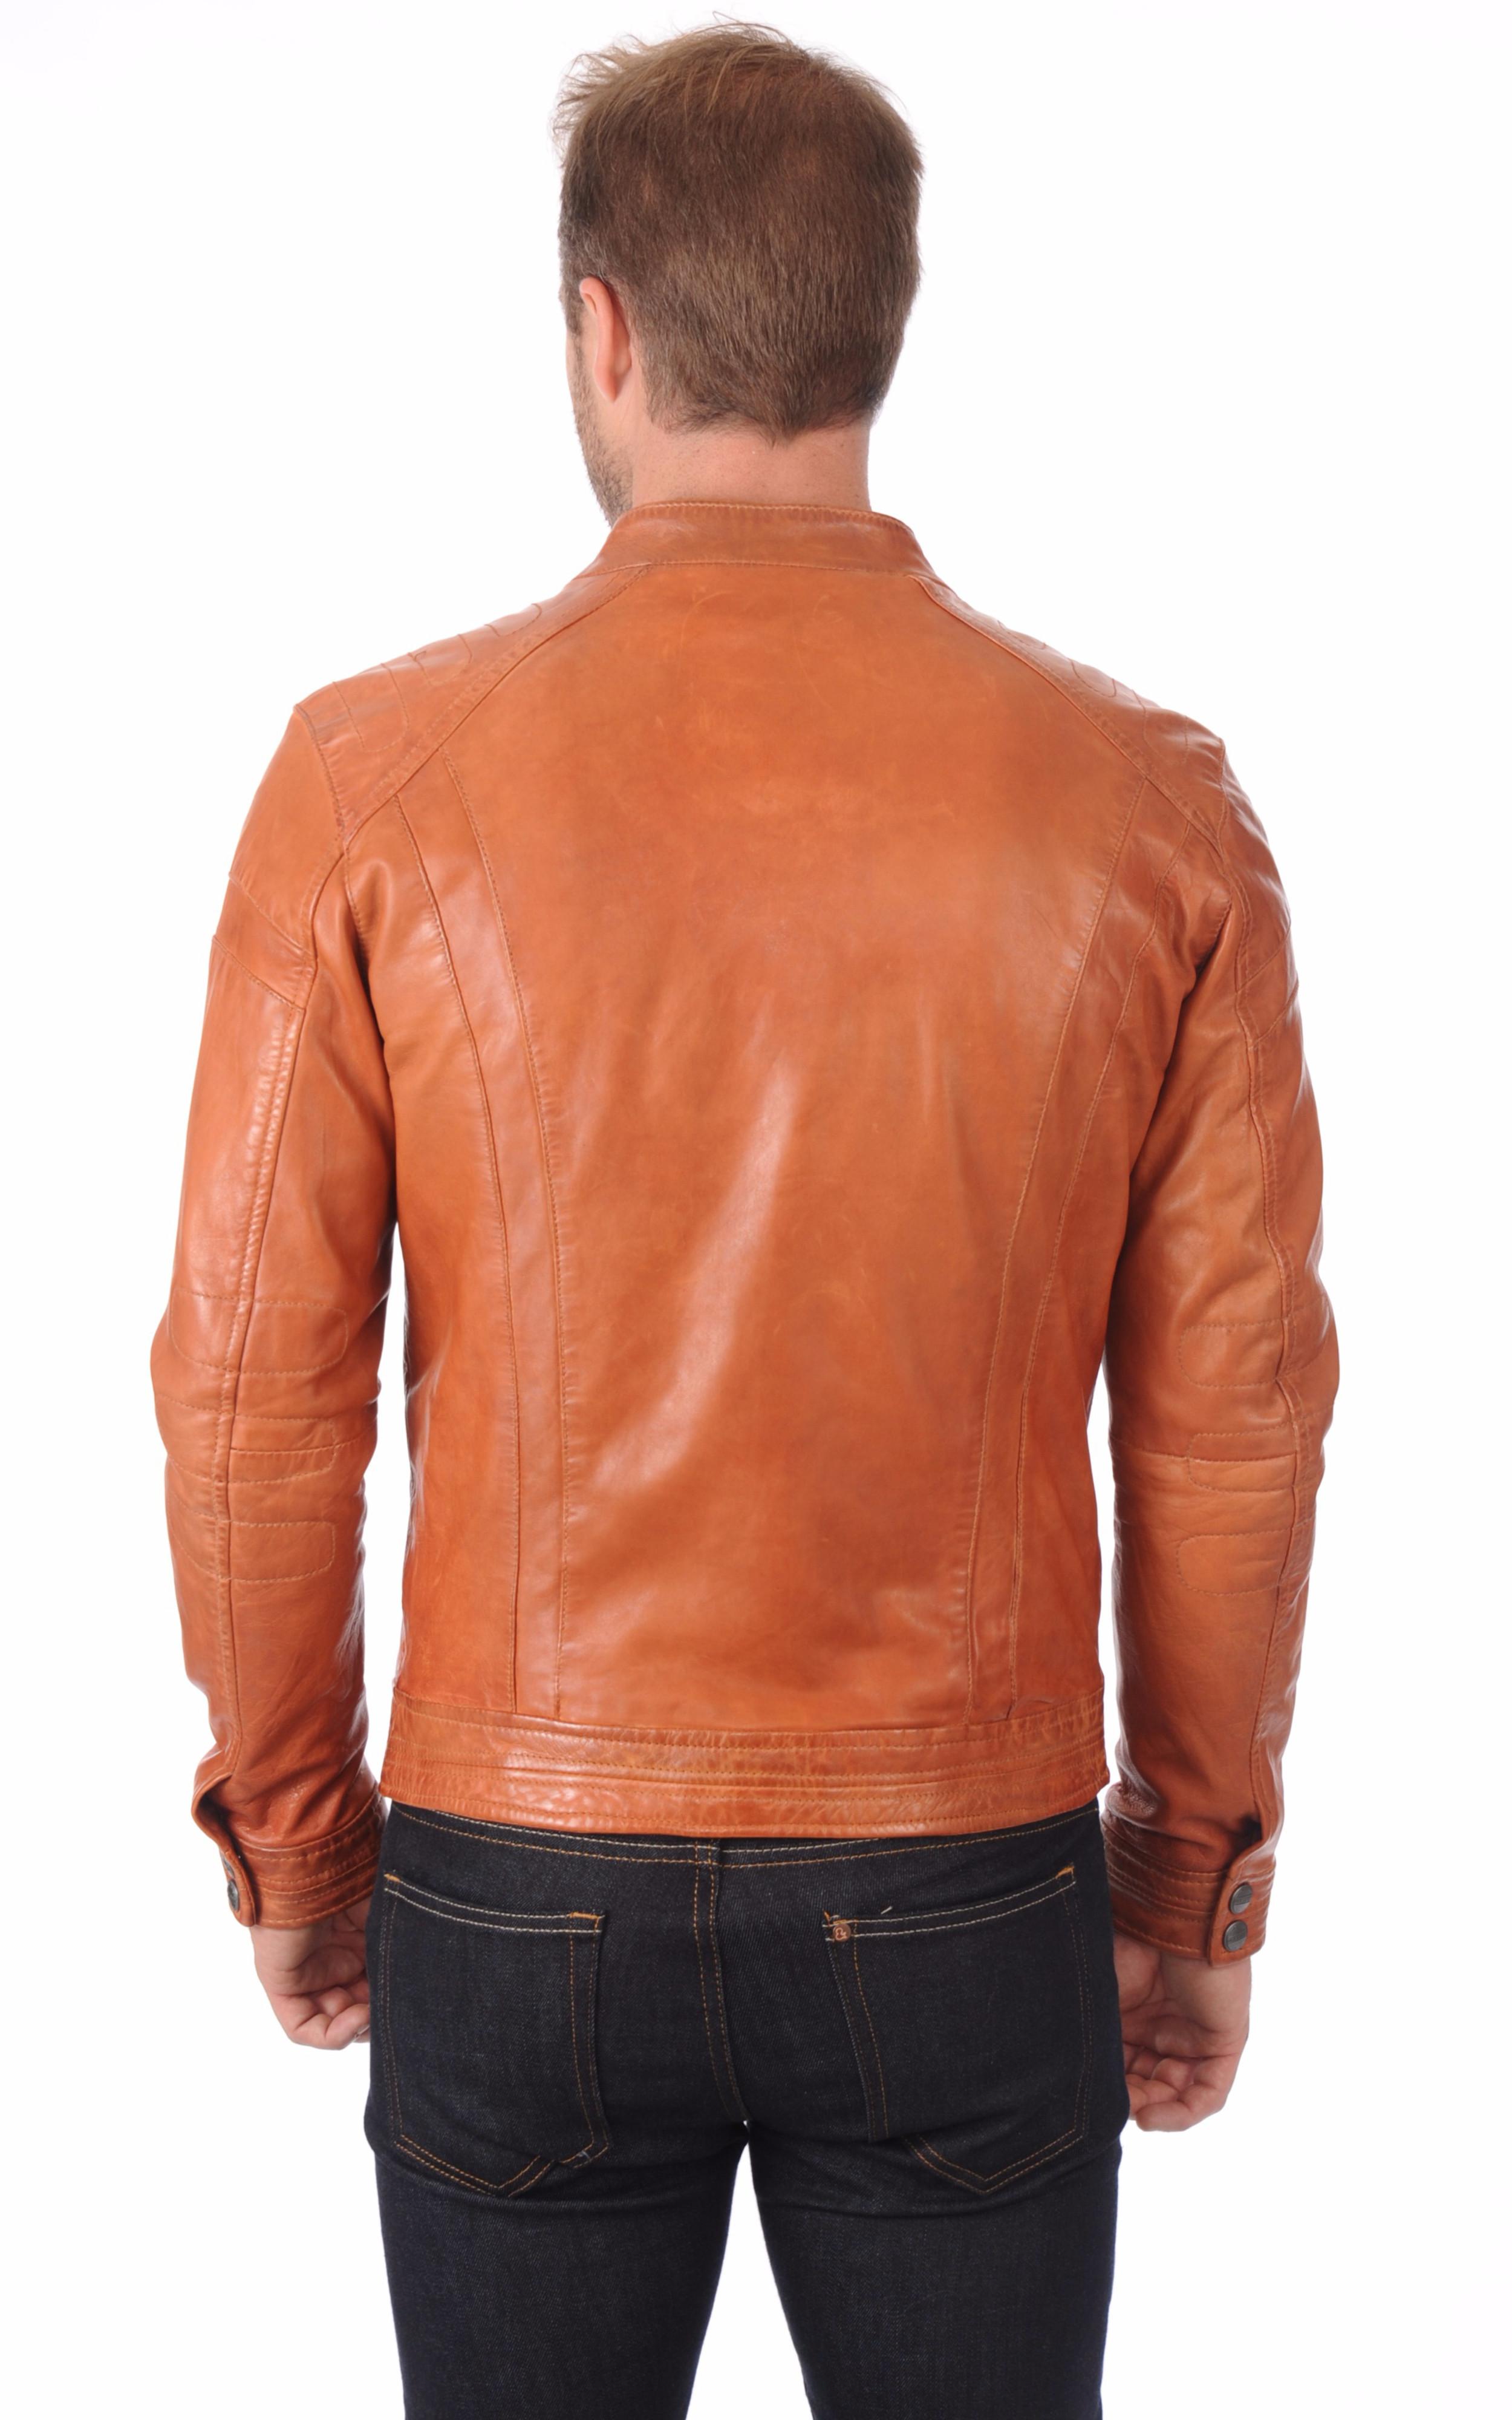 Blouson Motard Orange Daytona 73